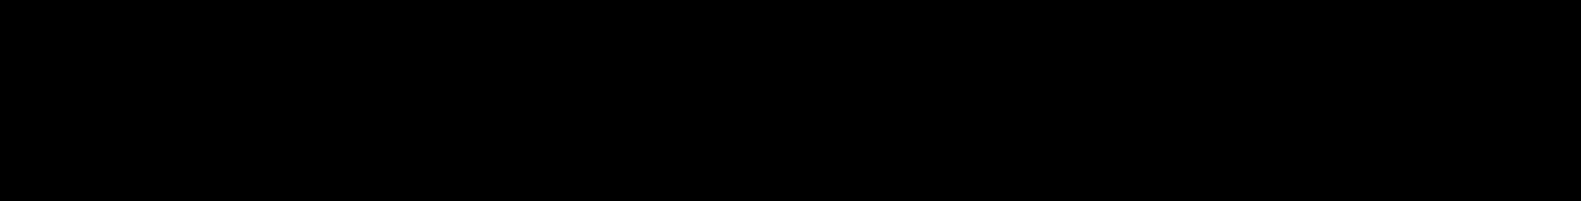 Psychatronic Oblique